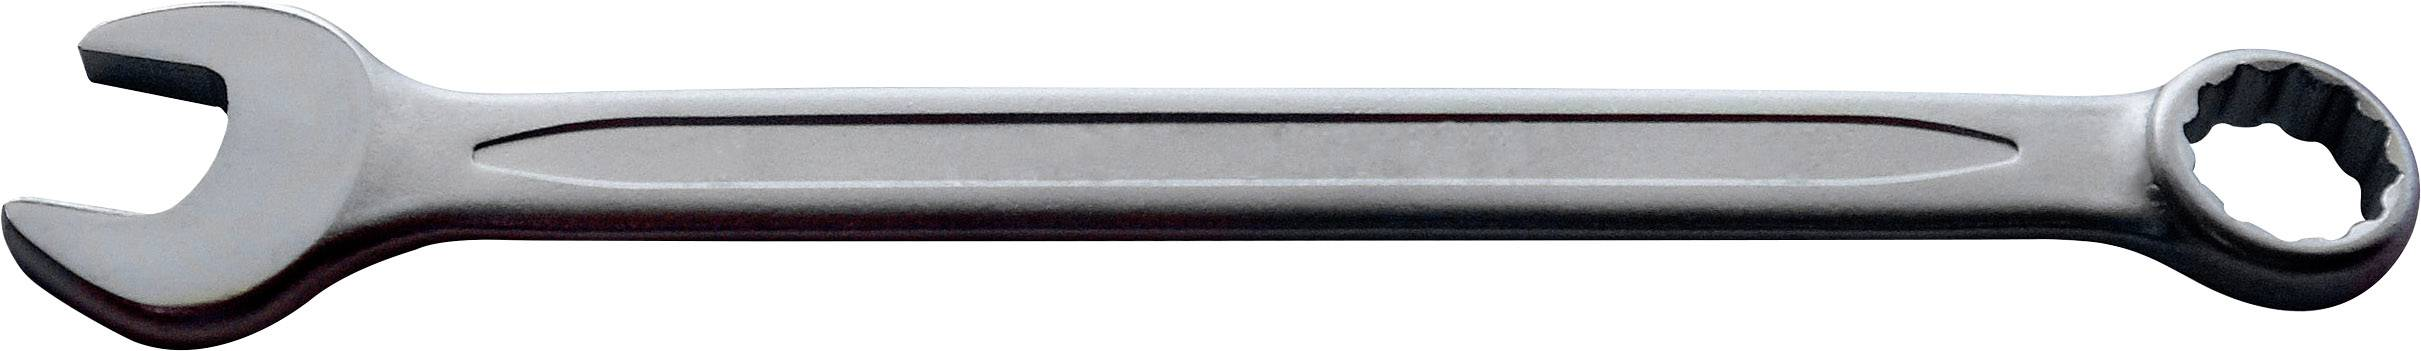 Očkoplochý klíč TOOLCRAFT 820832, N/A, 8 mm